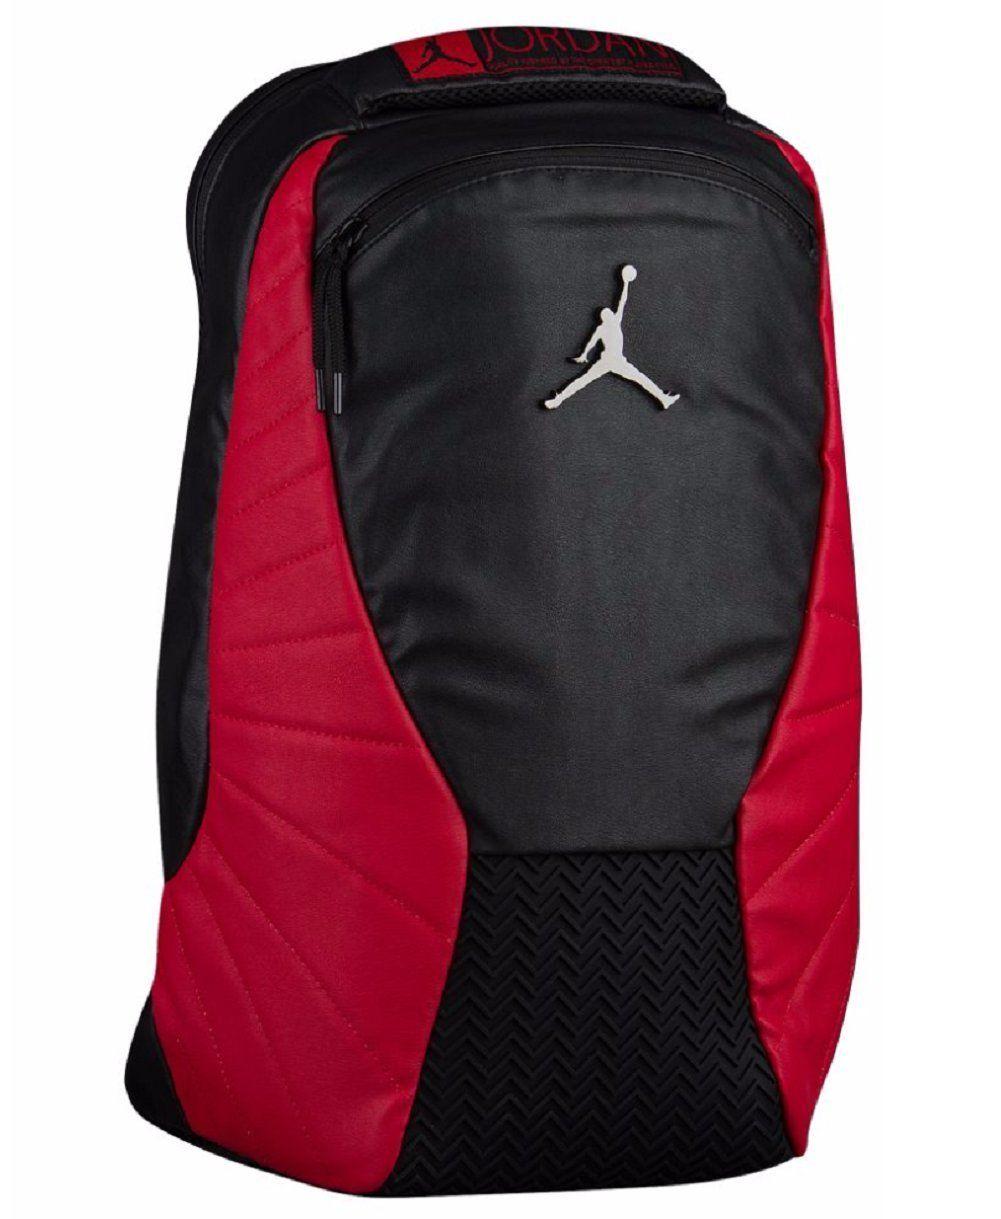 lowest price a46ee 4681b Amazon.com: Nike Jordan Retro 12 Backpack W/ Laptop Pocket ...